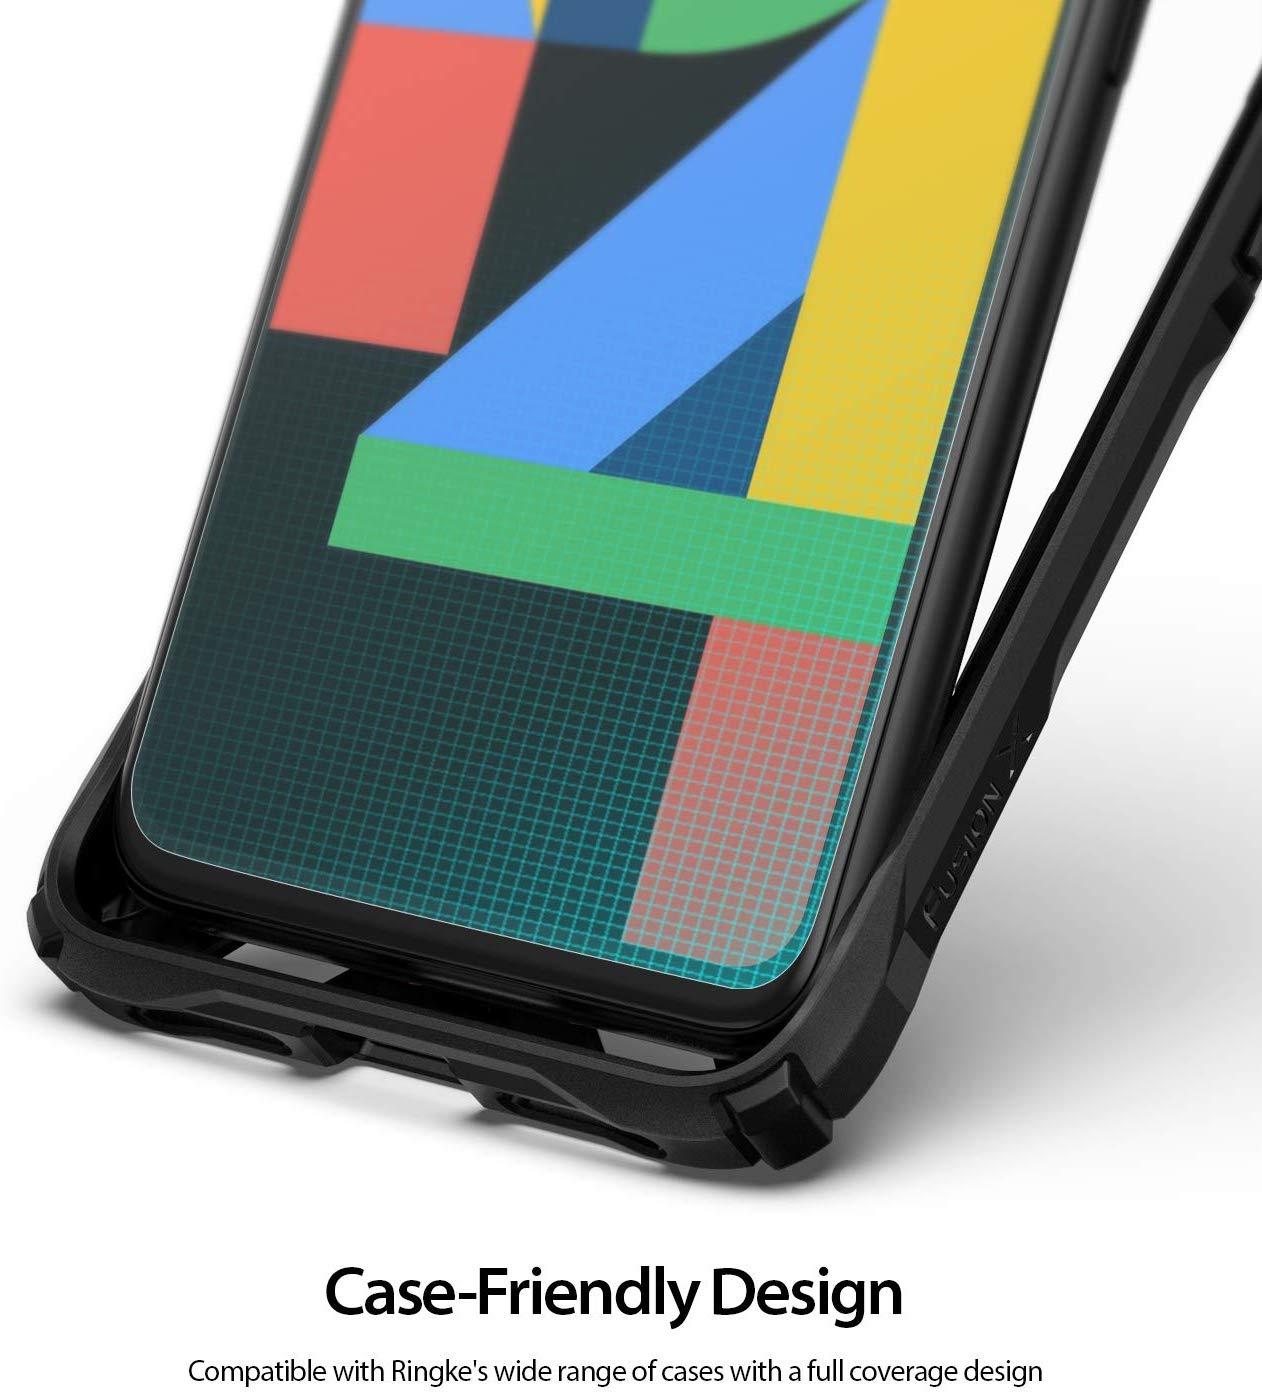 Película Ringke Dual Easy - Pack 2x - Google Pixel 4 XL (Tela 6.3)